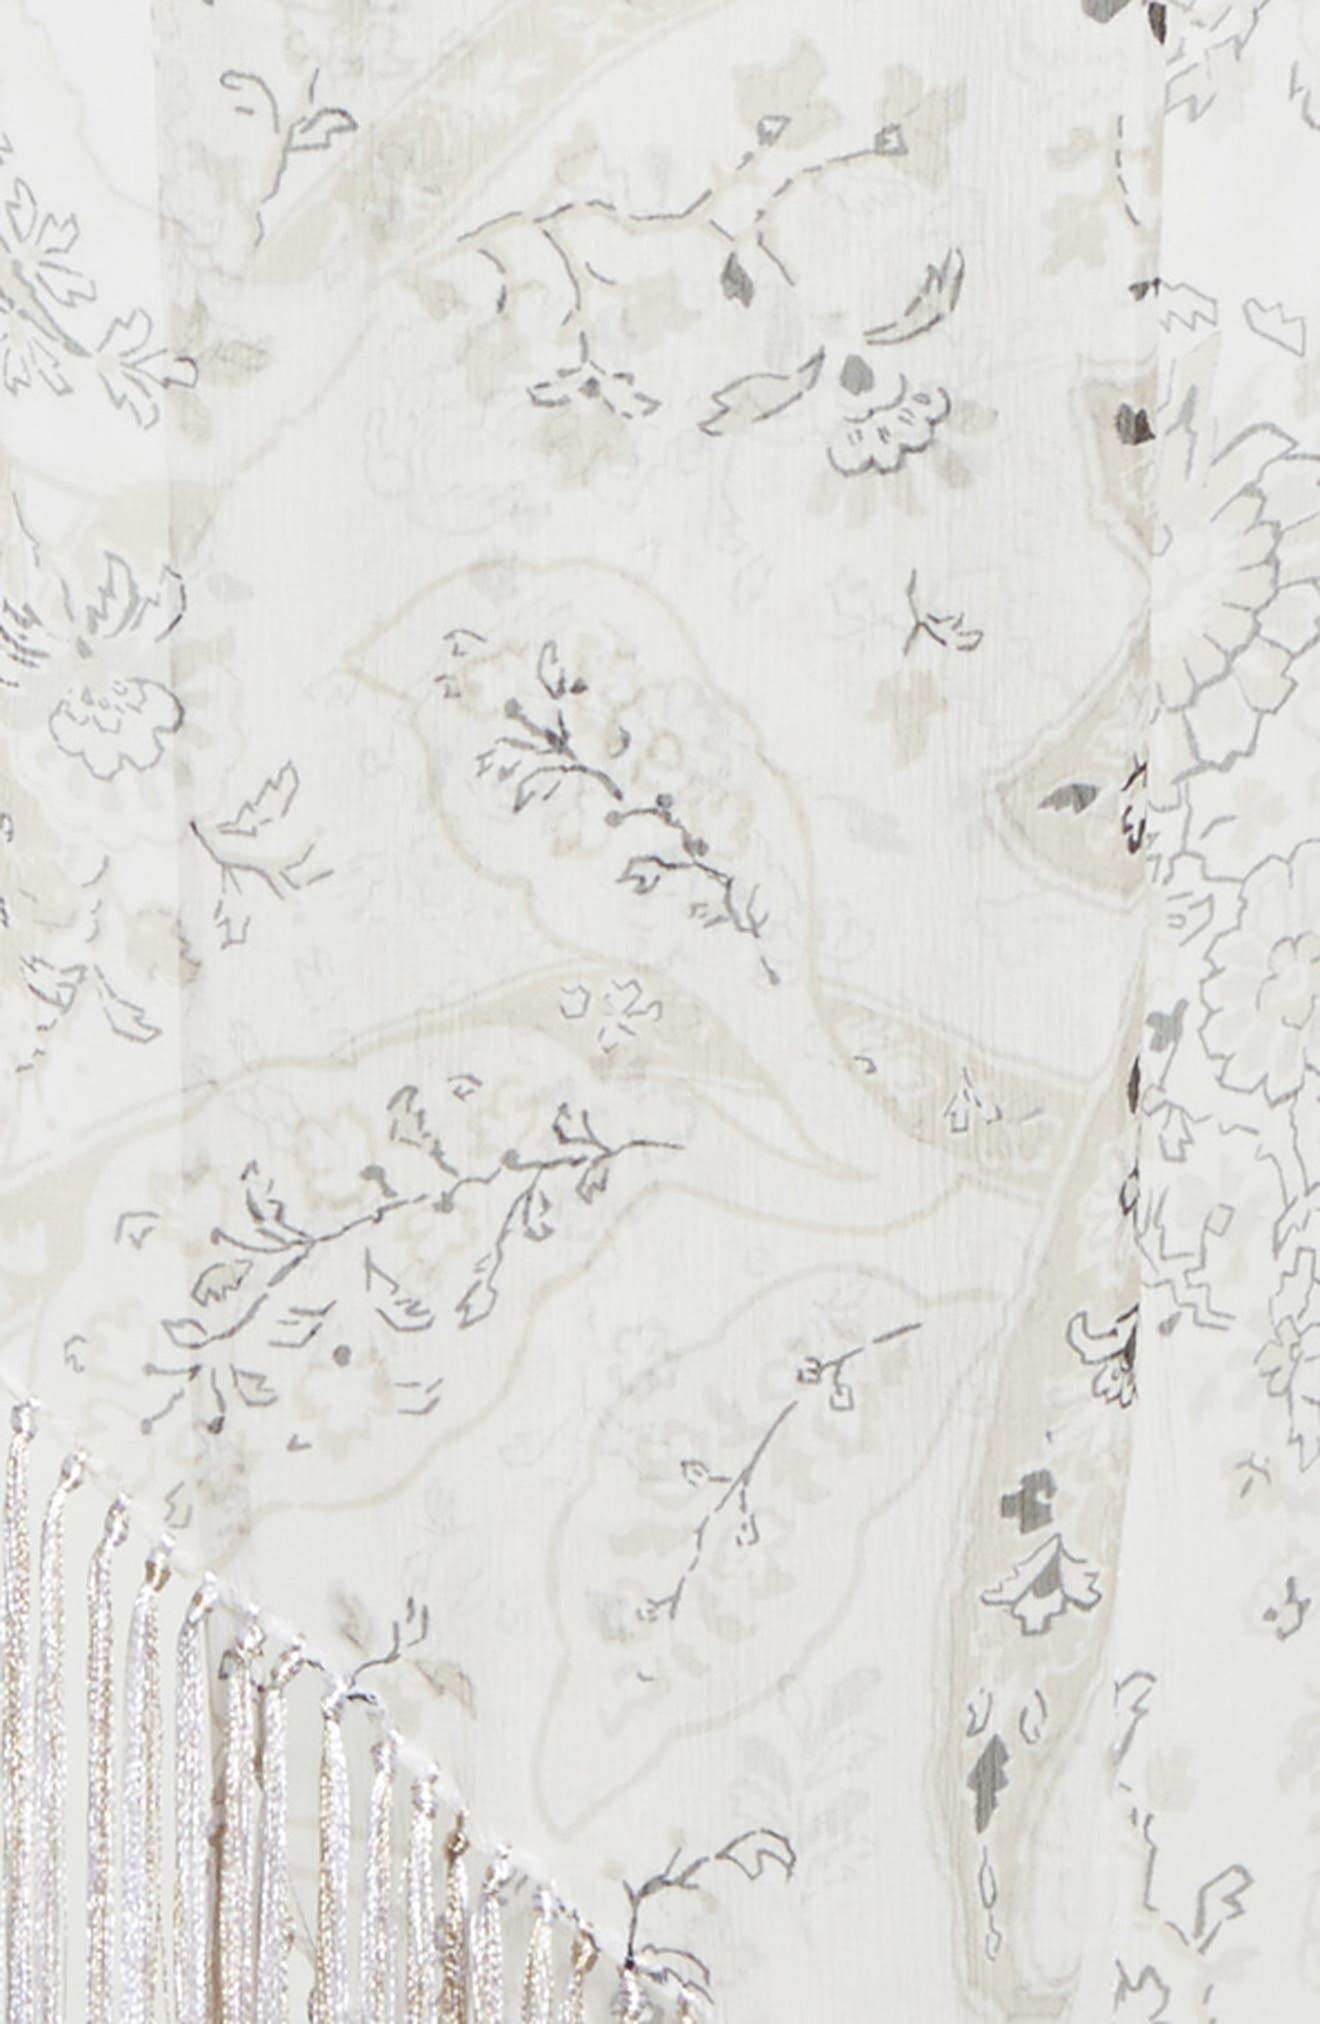 Maharaja Print Scarf with Fringe,                             Alternate thumbnail 4, color,                             WHITE MULTI